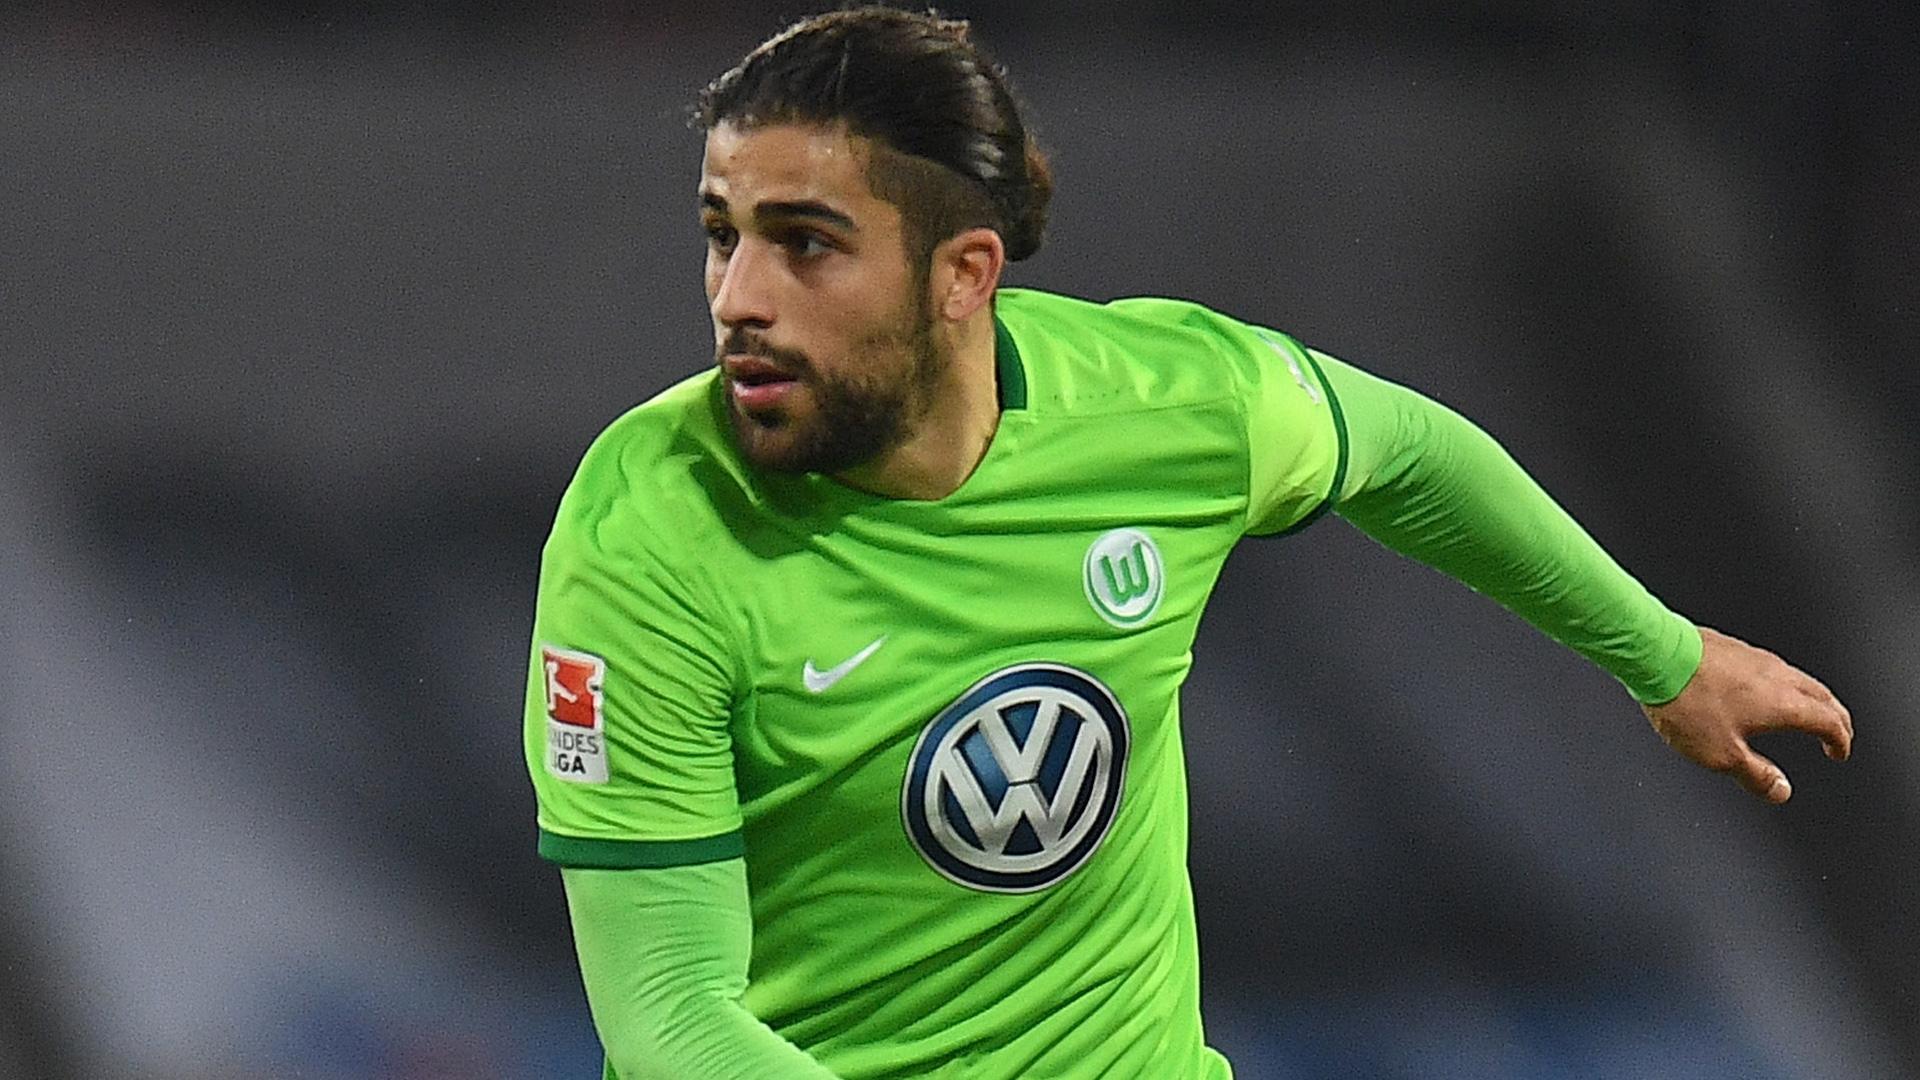 Sky - Milan, in arrivo Ricardo Rodriguez dal Wolfsburg: cifre e dettagli